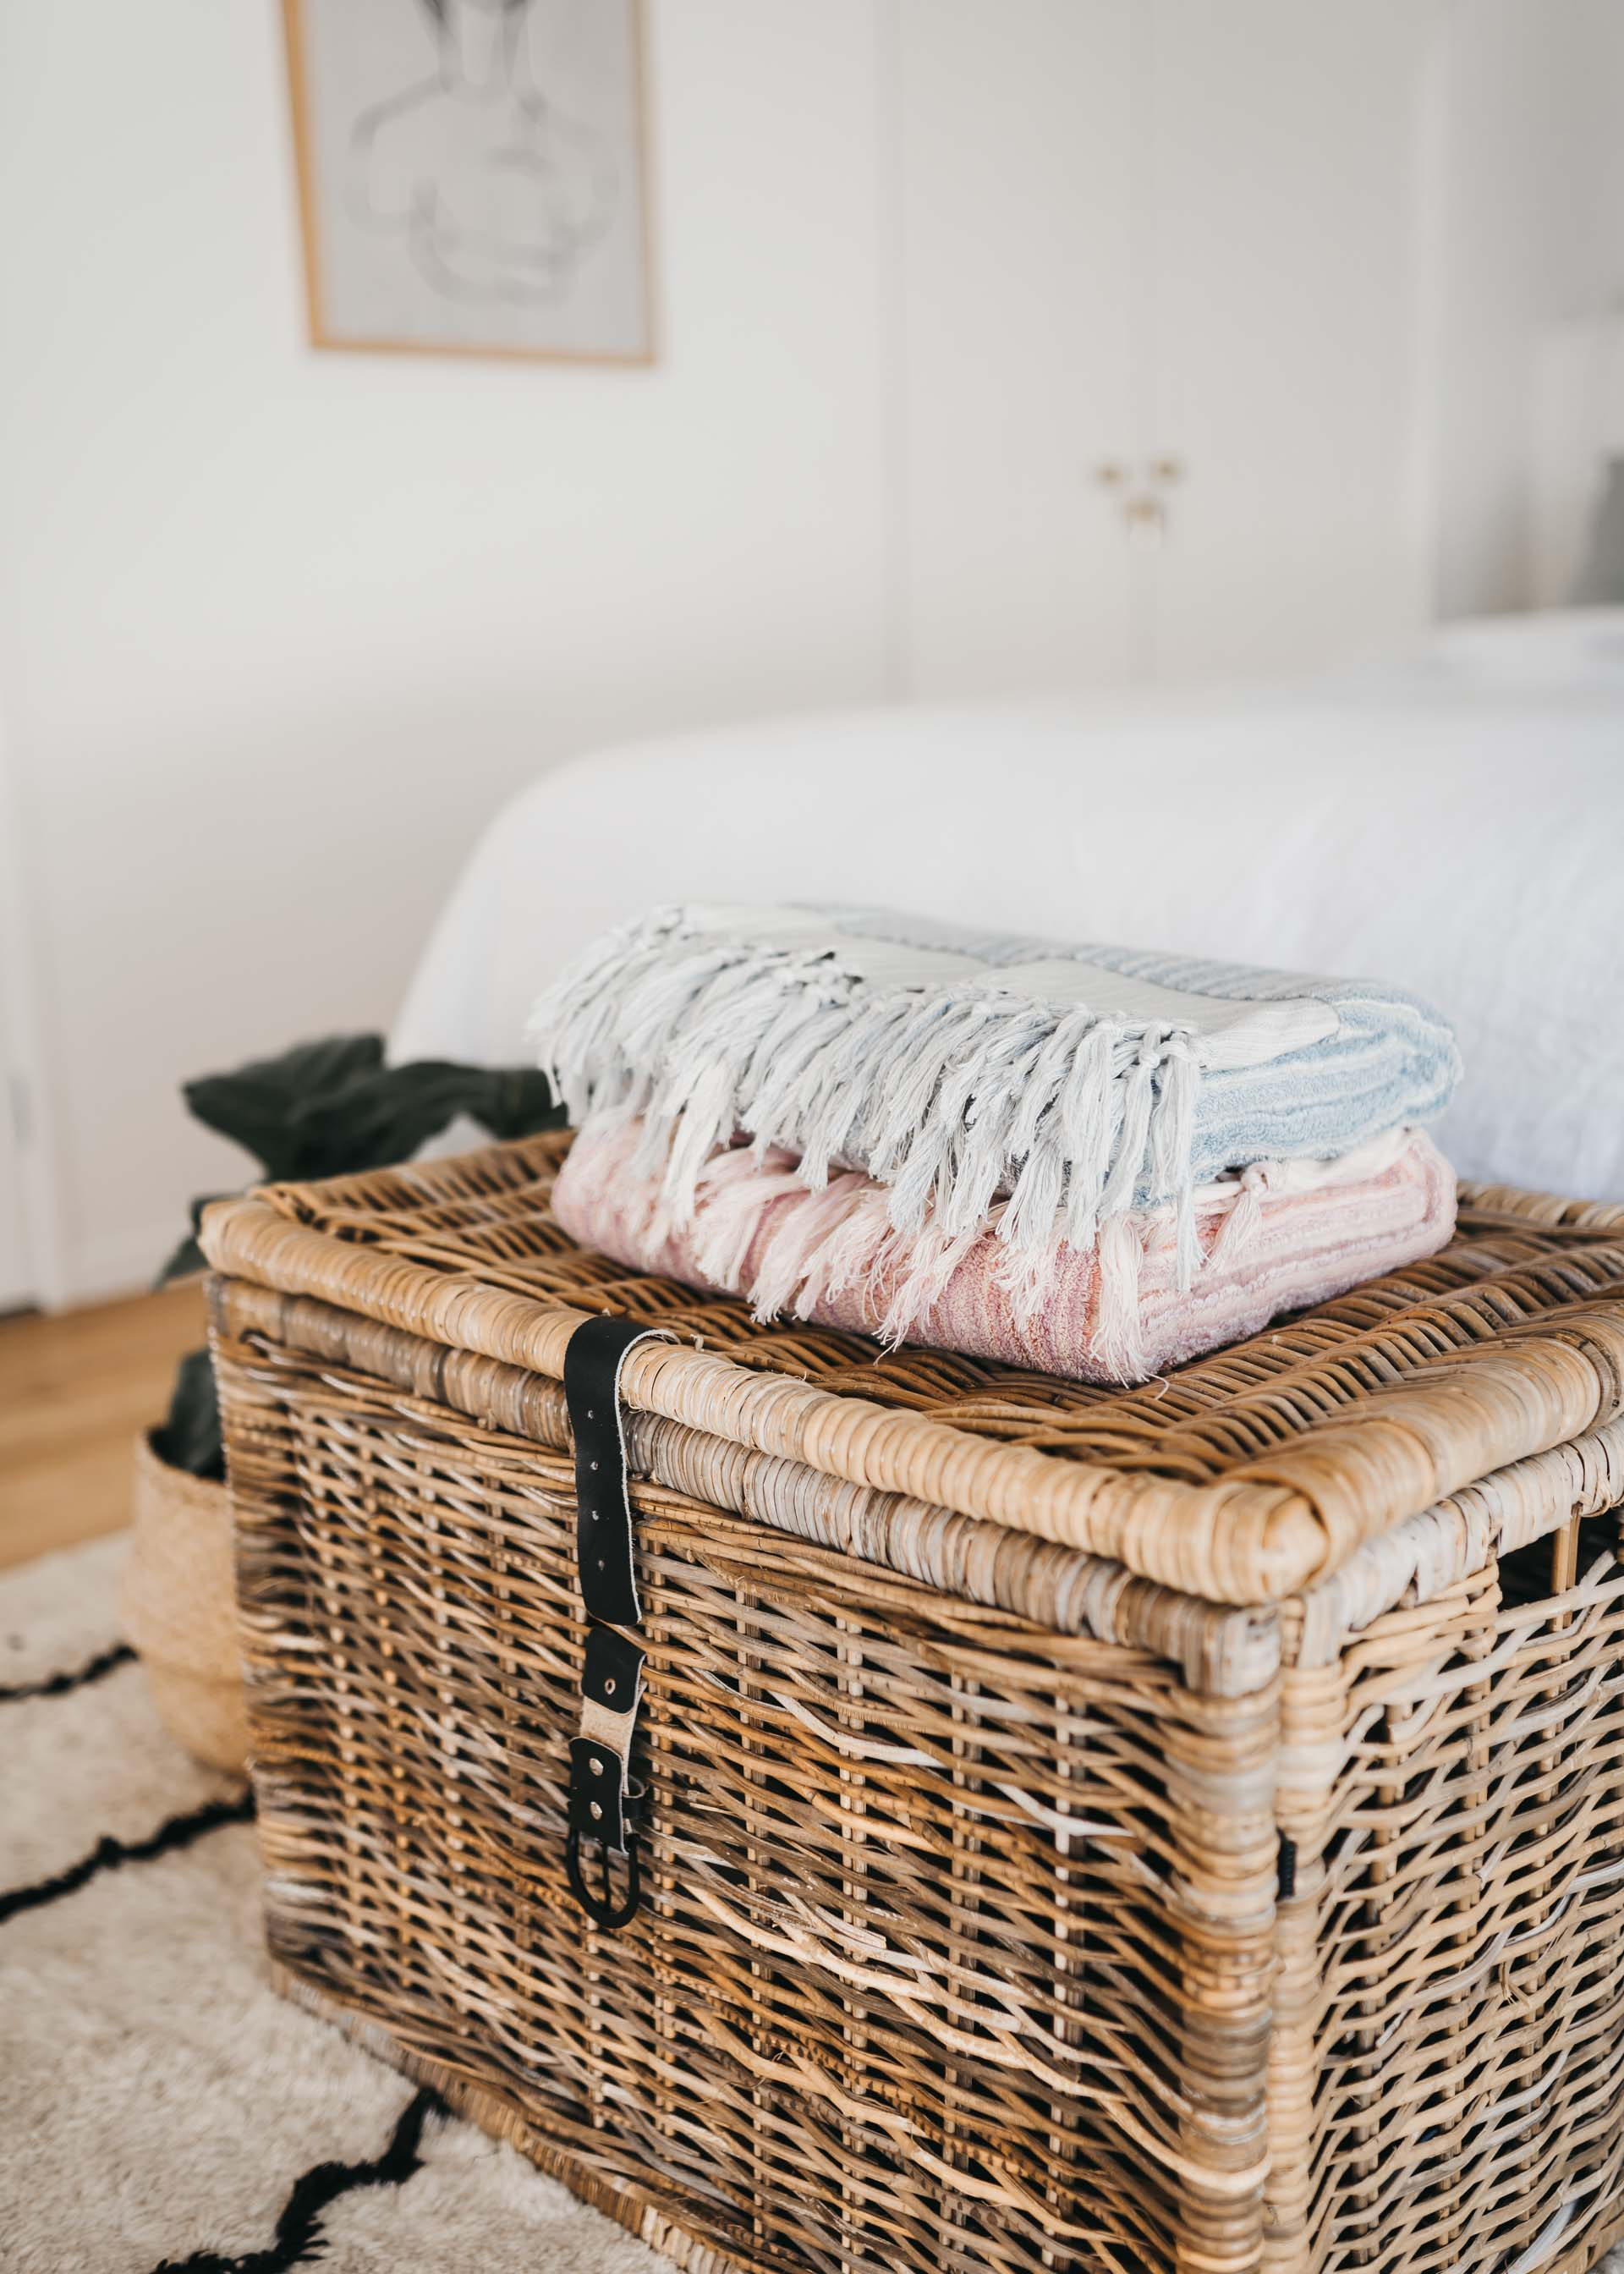 keira-mason-aegean-loom-bath-towels-on-basket.jpg